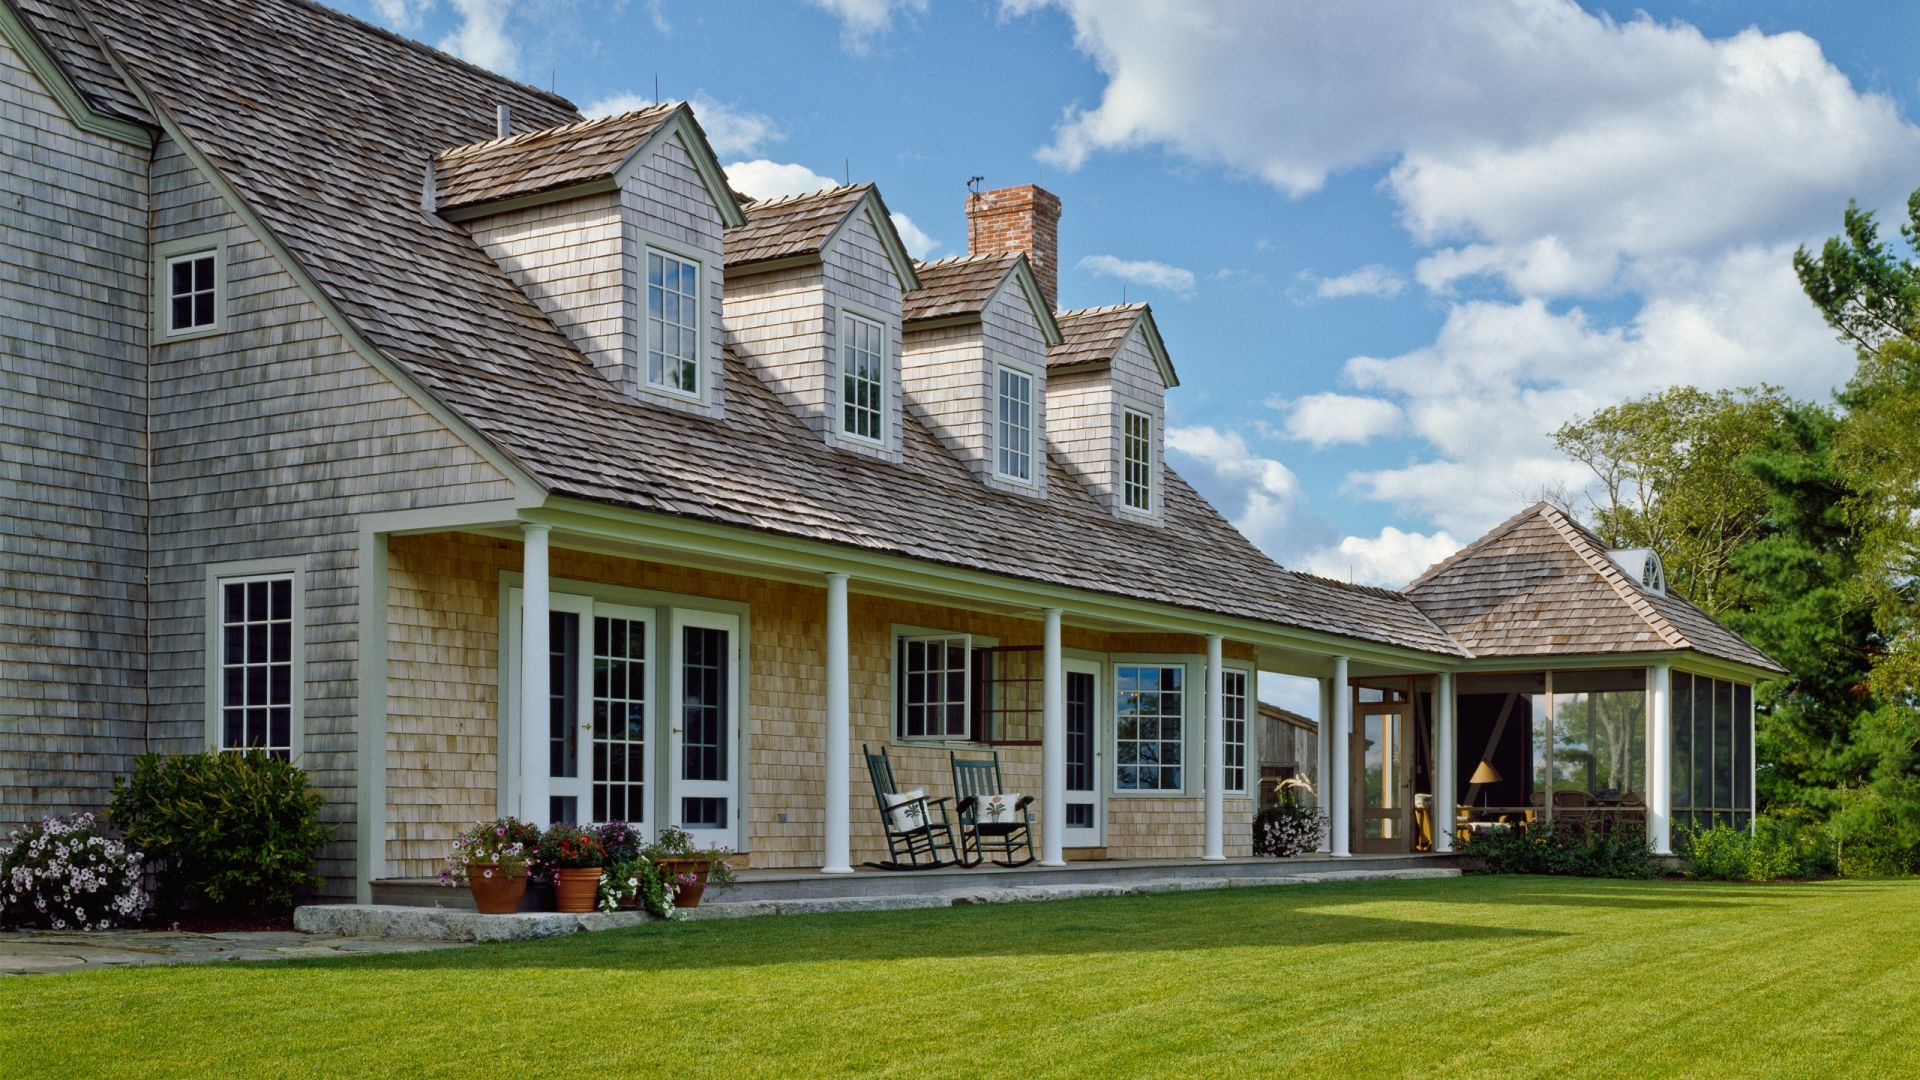 Highland farm residence greater portland maine whitten